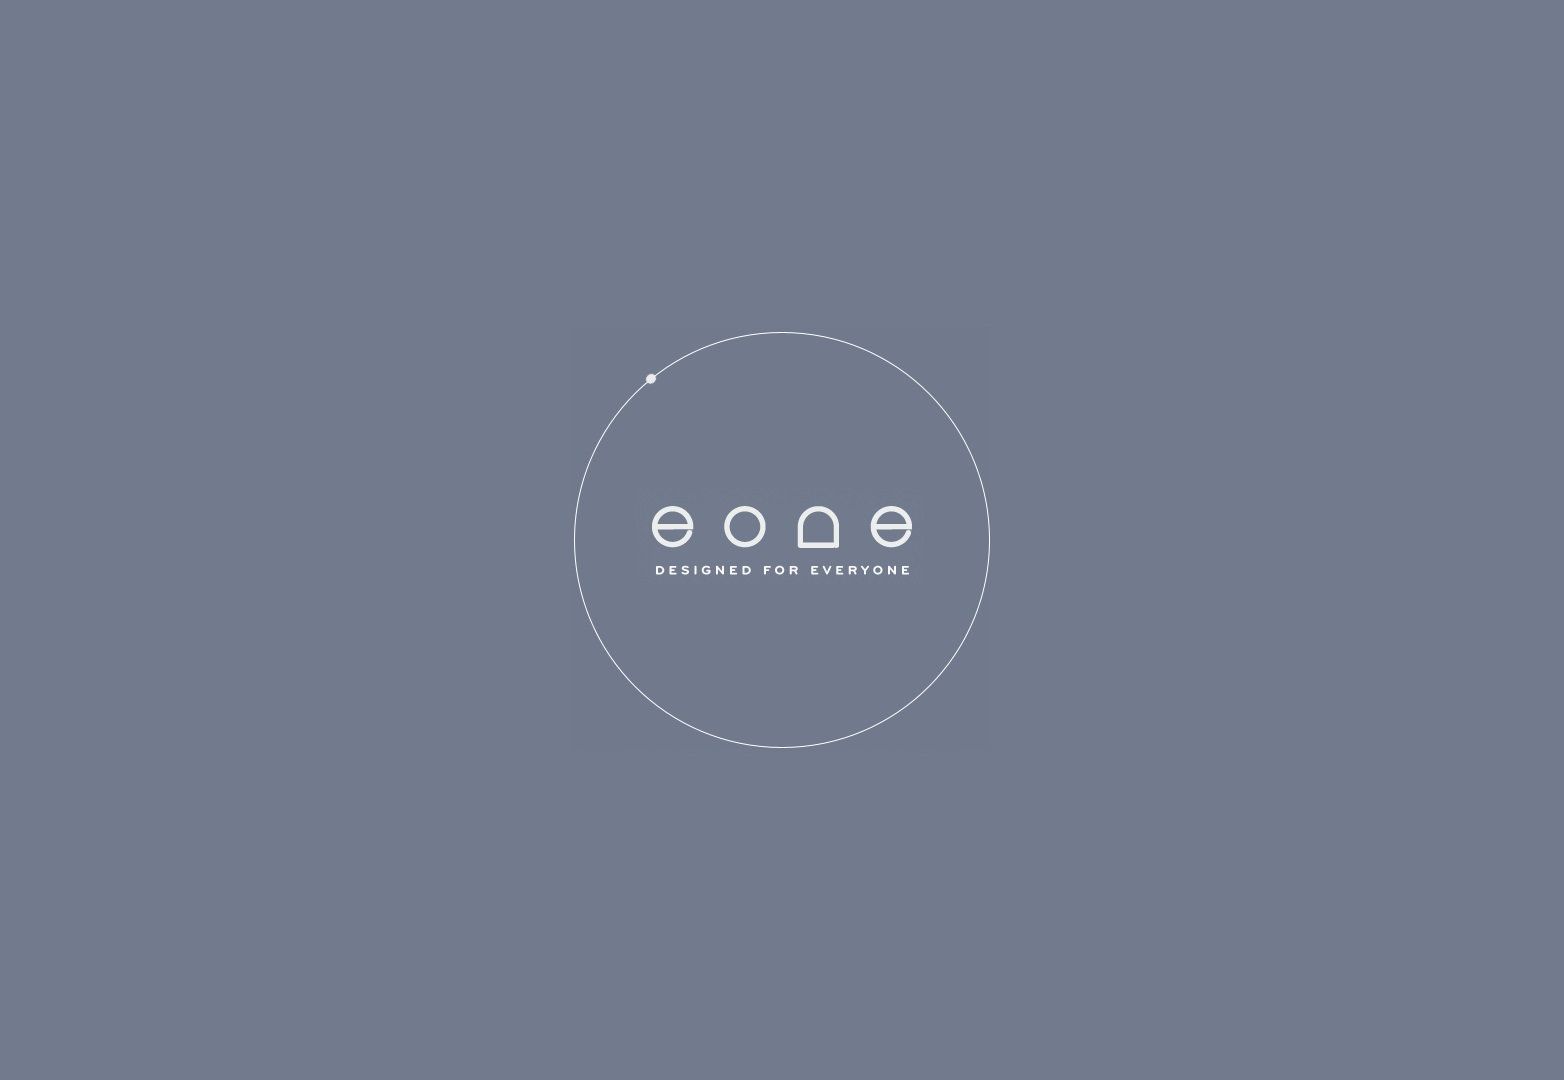 Eone – Designed for everyone